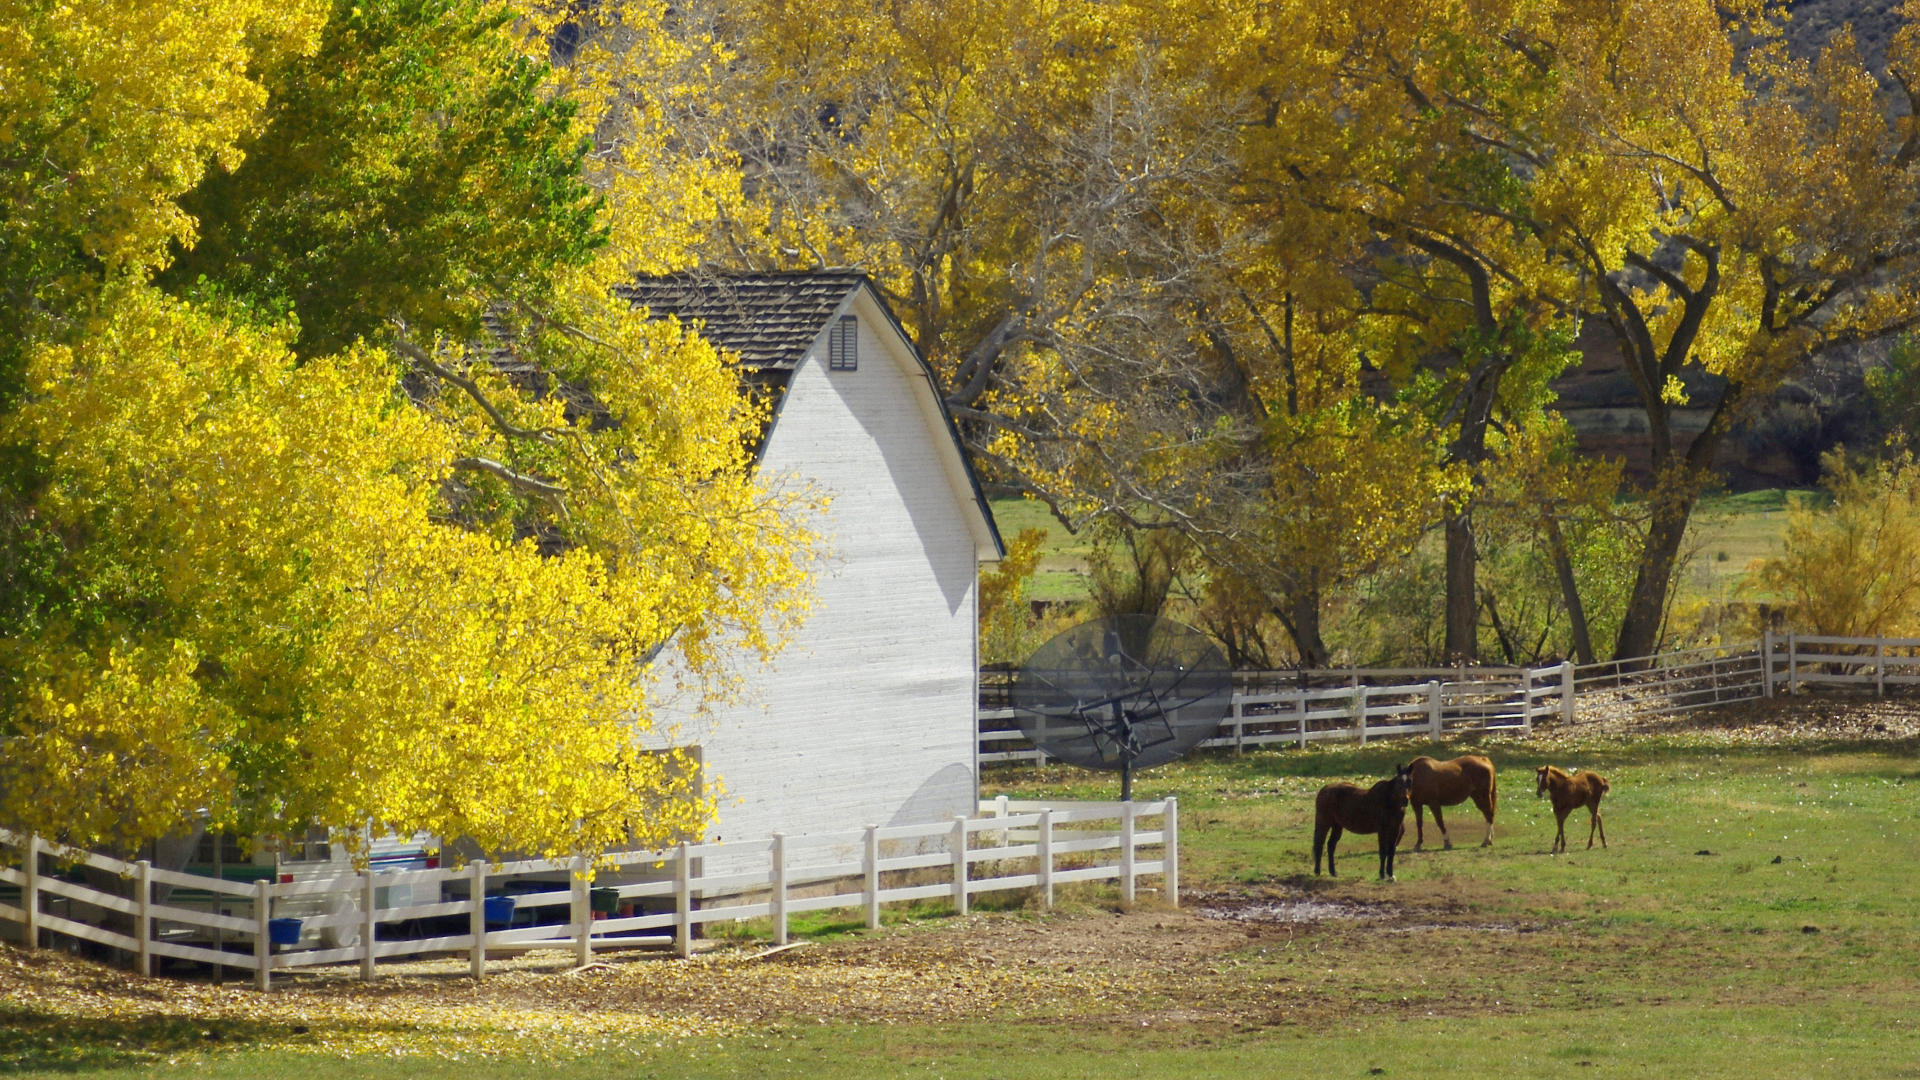 Autumn Country Farm 1920x1080